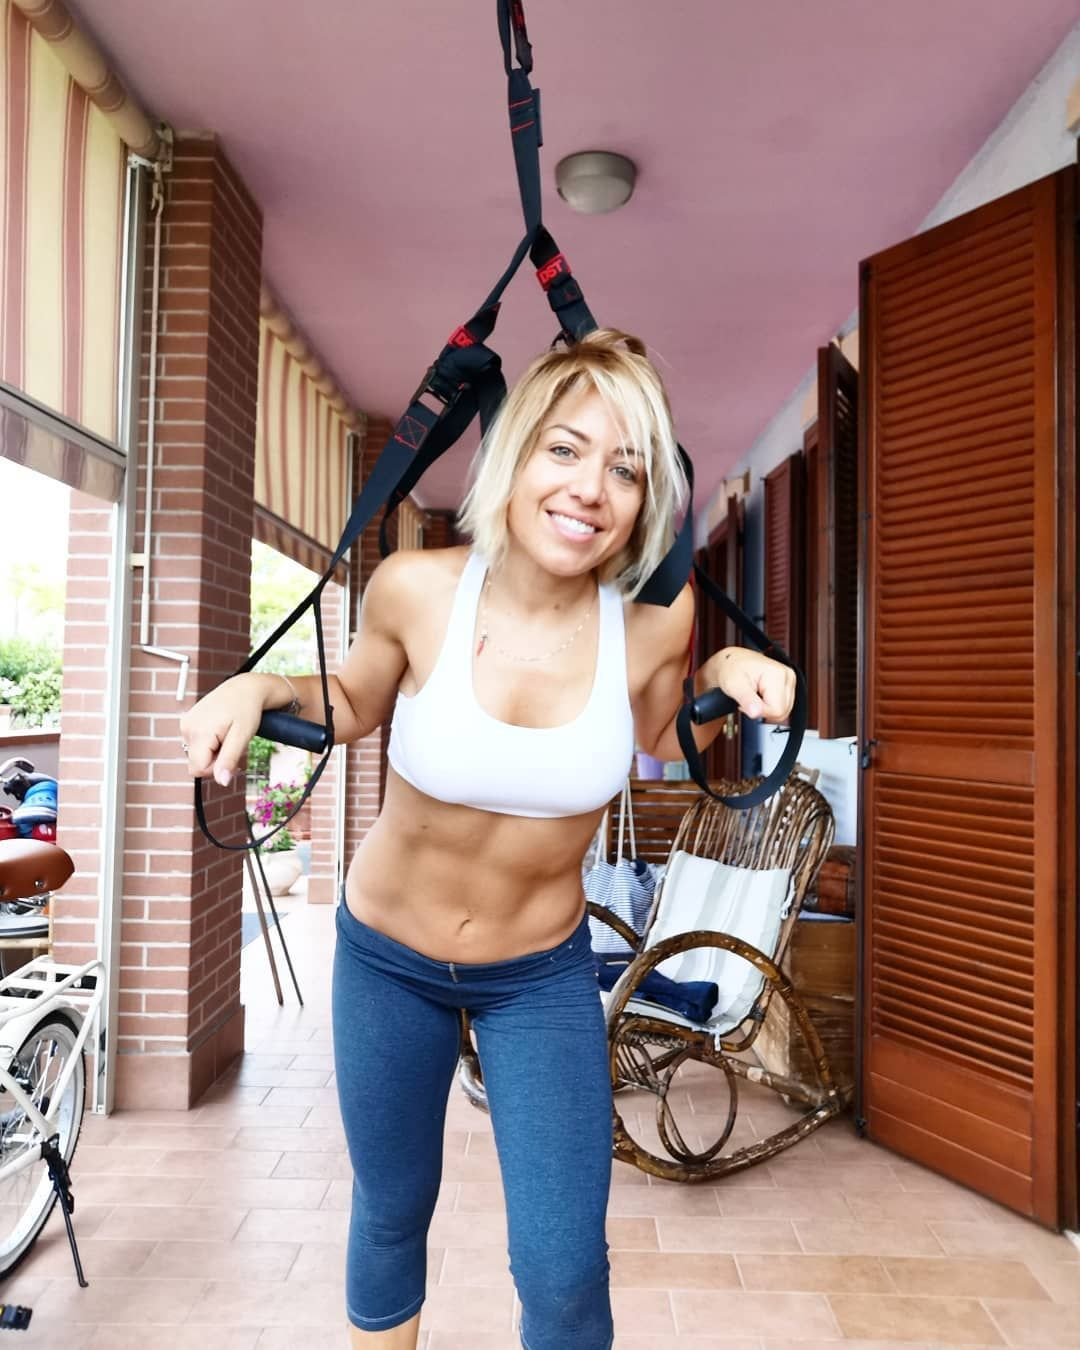 #chisifermaperduto #homeworkout #girlfitness #fitness #youcan #sport #home #body #trx #bf#homework...